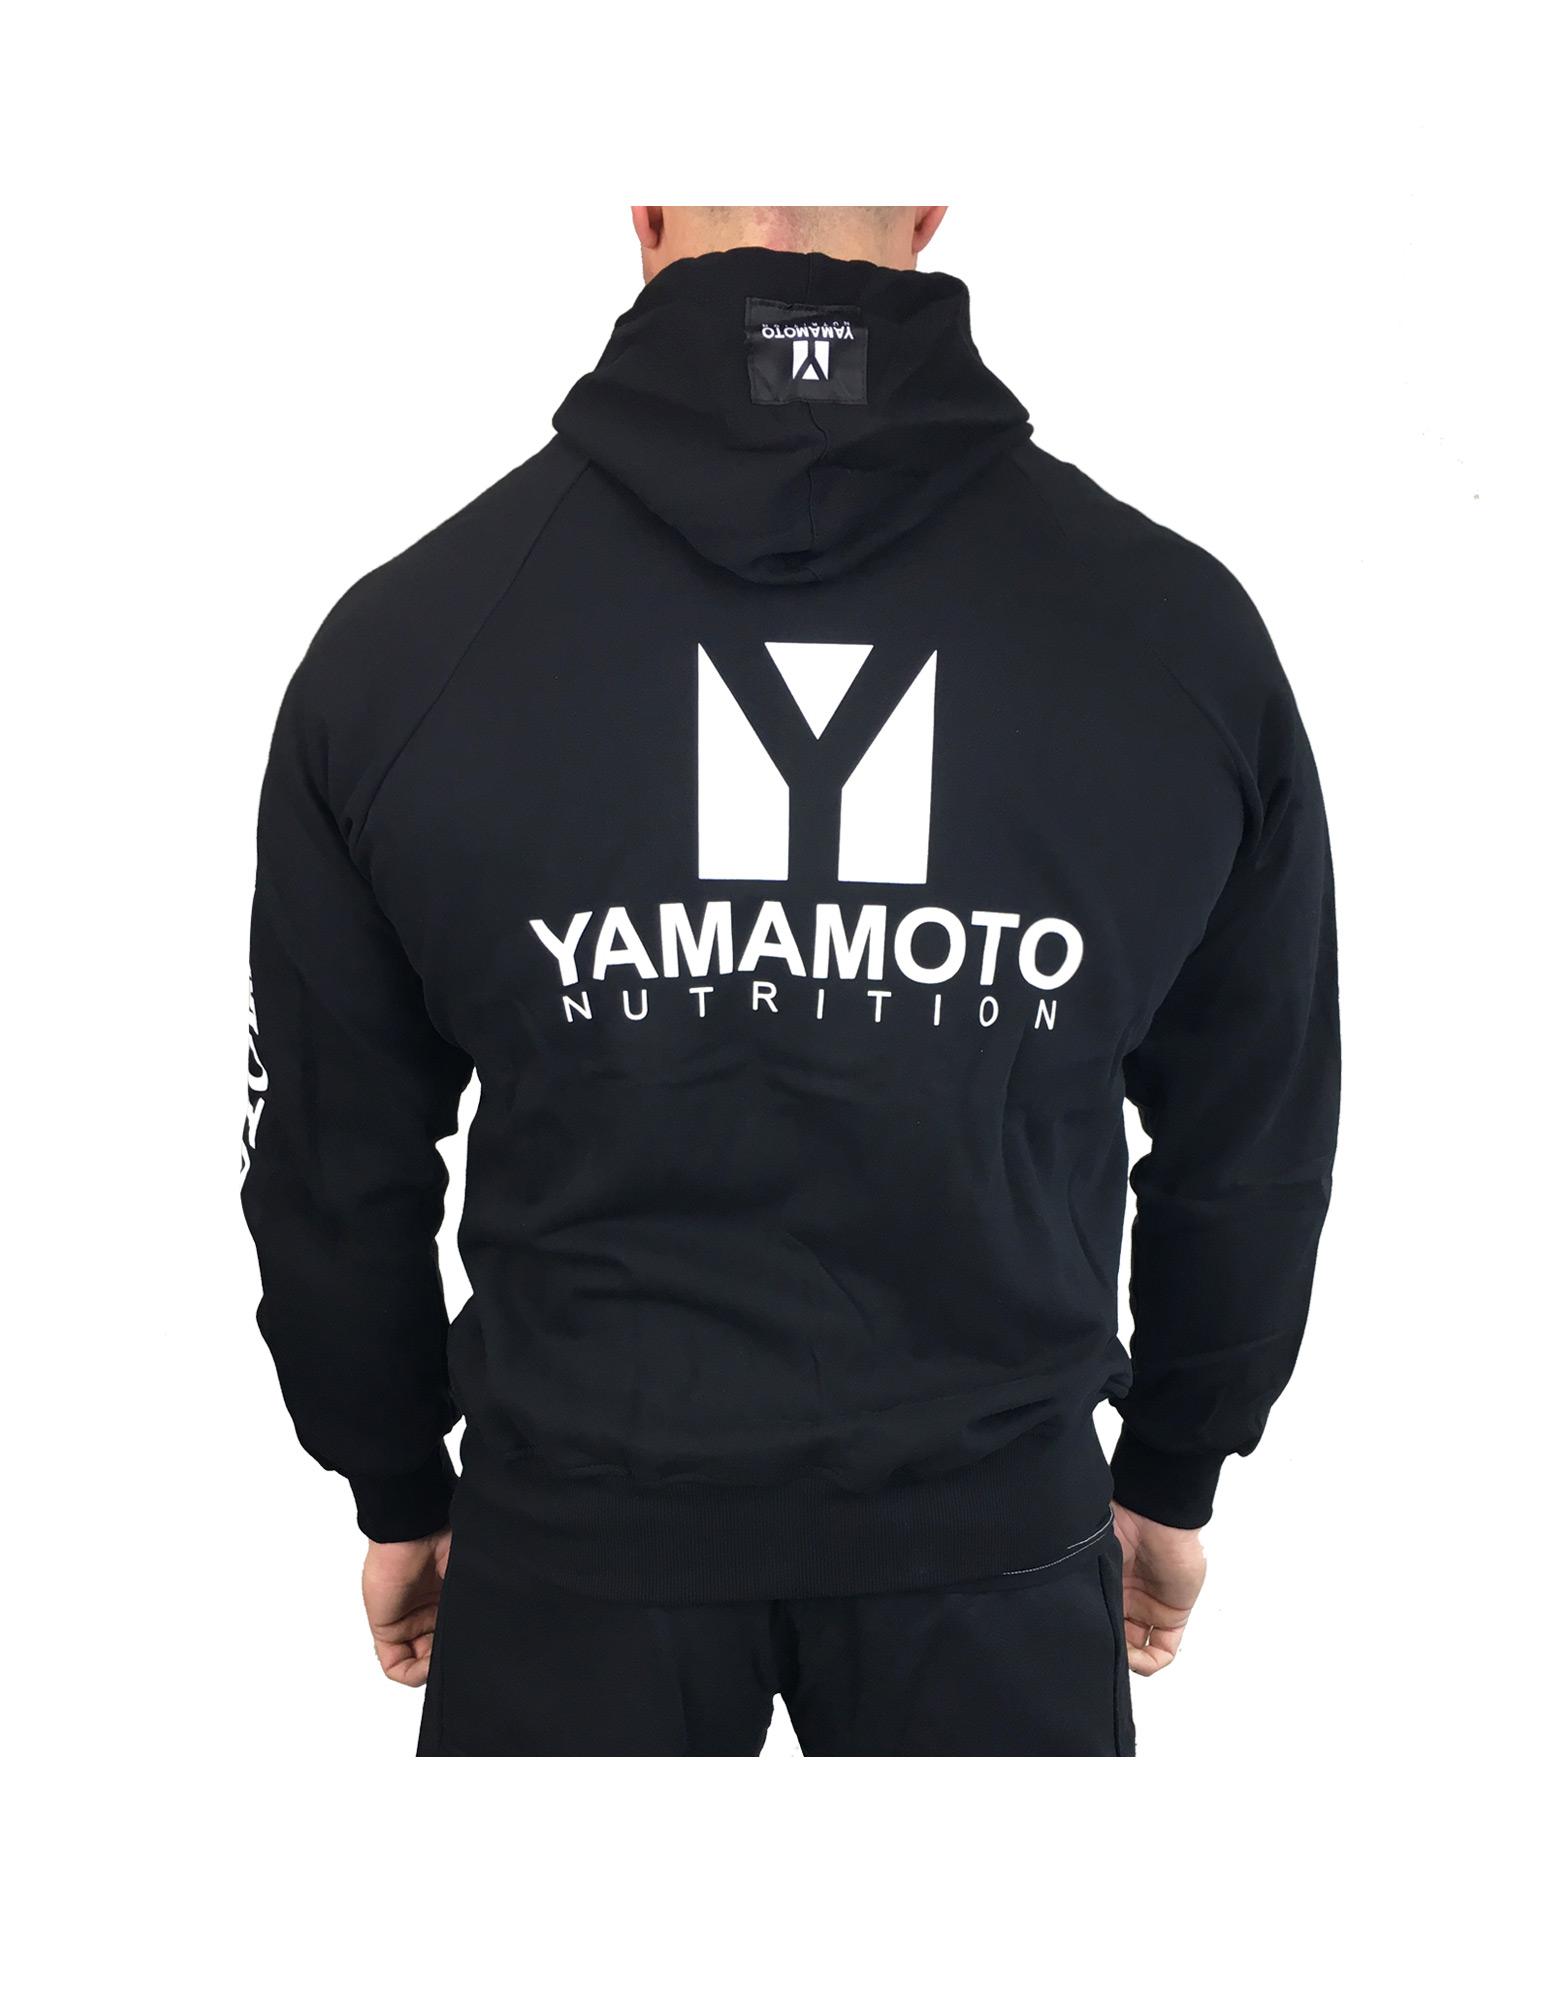 Sweatshirt Pro Team Yamamoto By Yamamoto Nutrition Colour